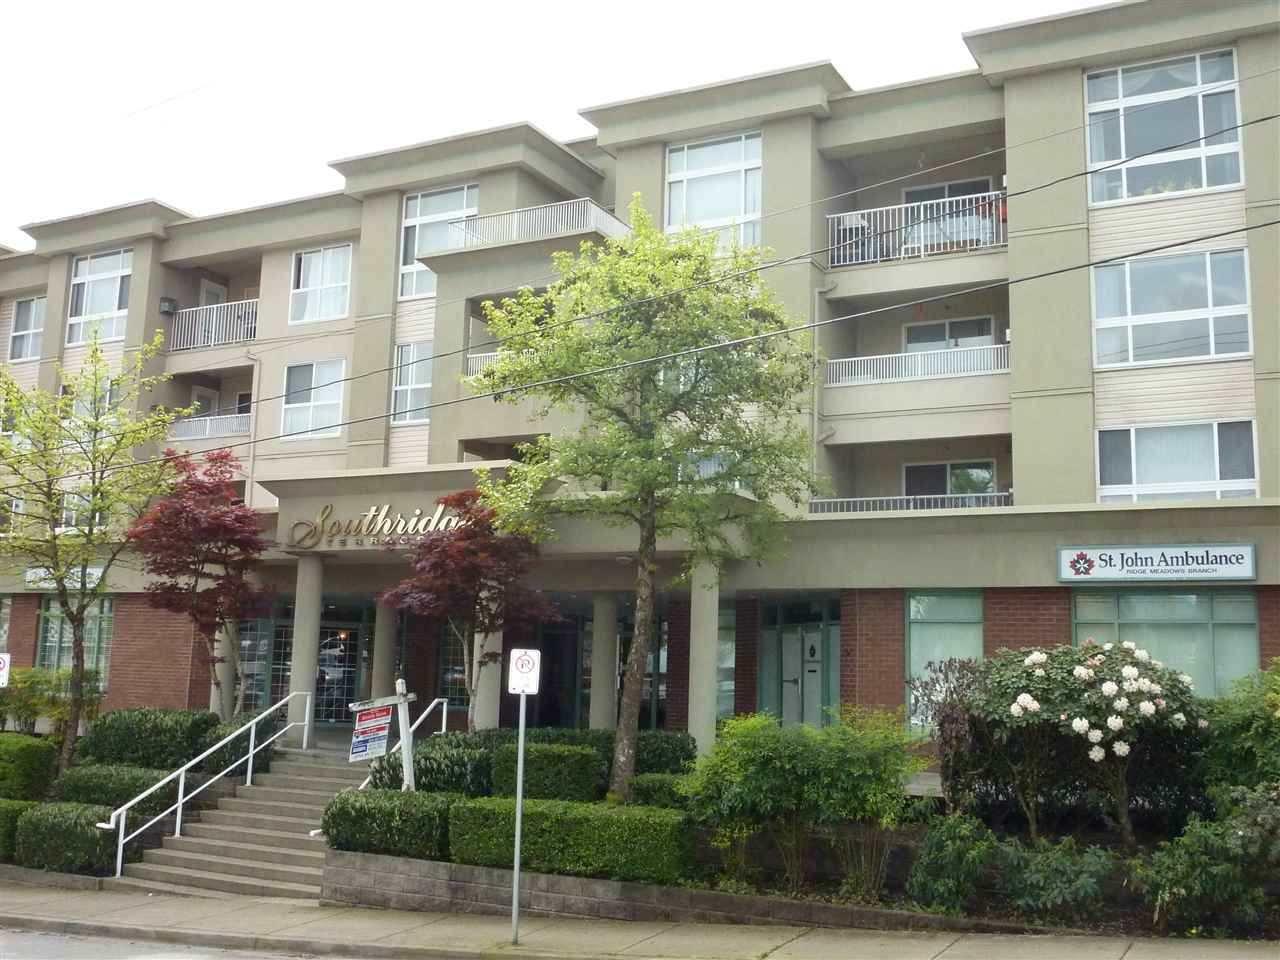 Main Photo: 503 22230 NORTH AVENUE in : West Central Condo for sale : MLS®# R2298957